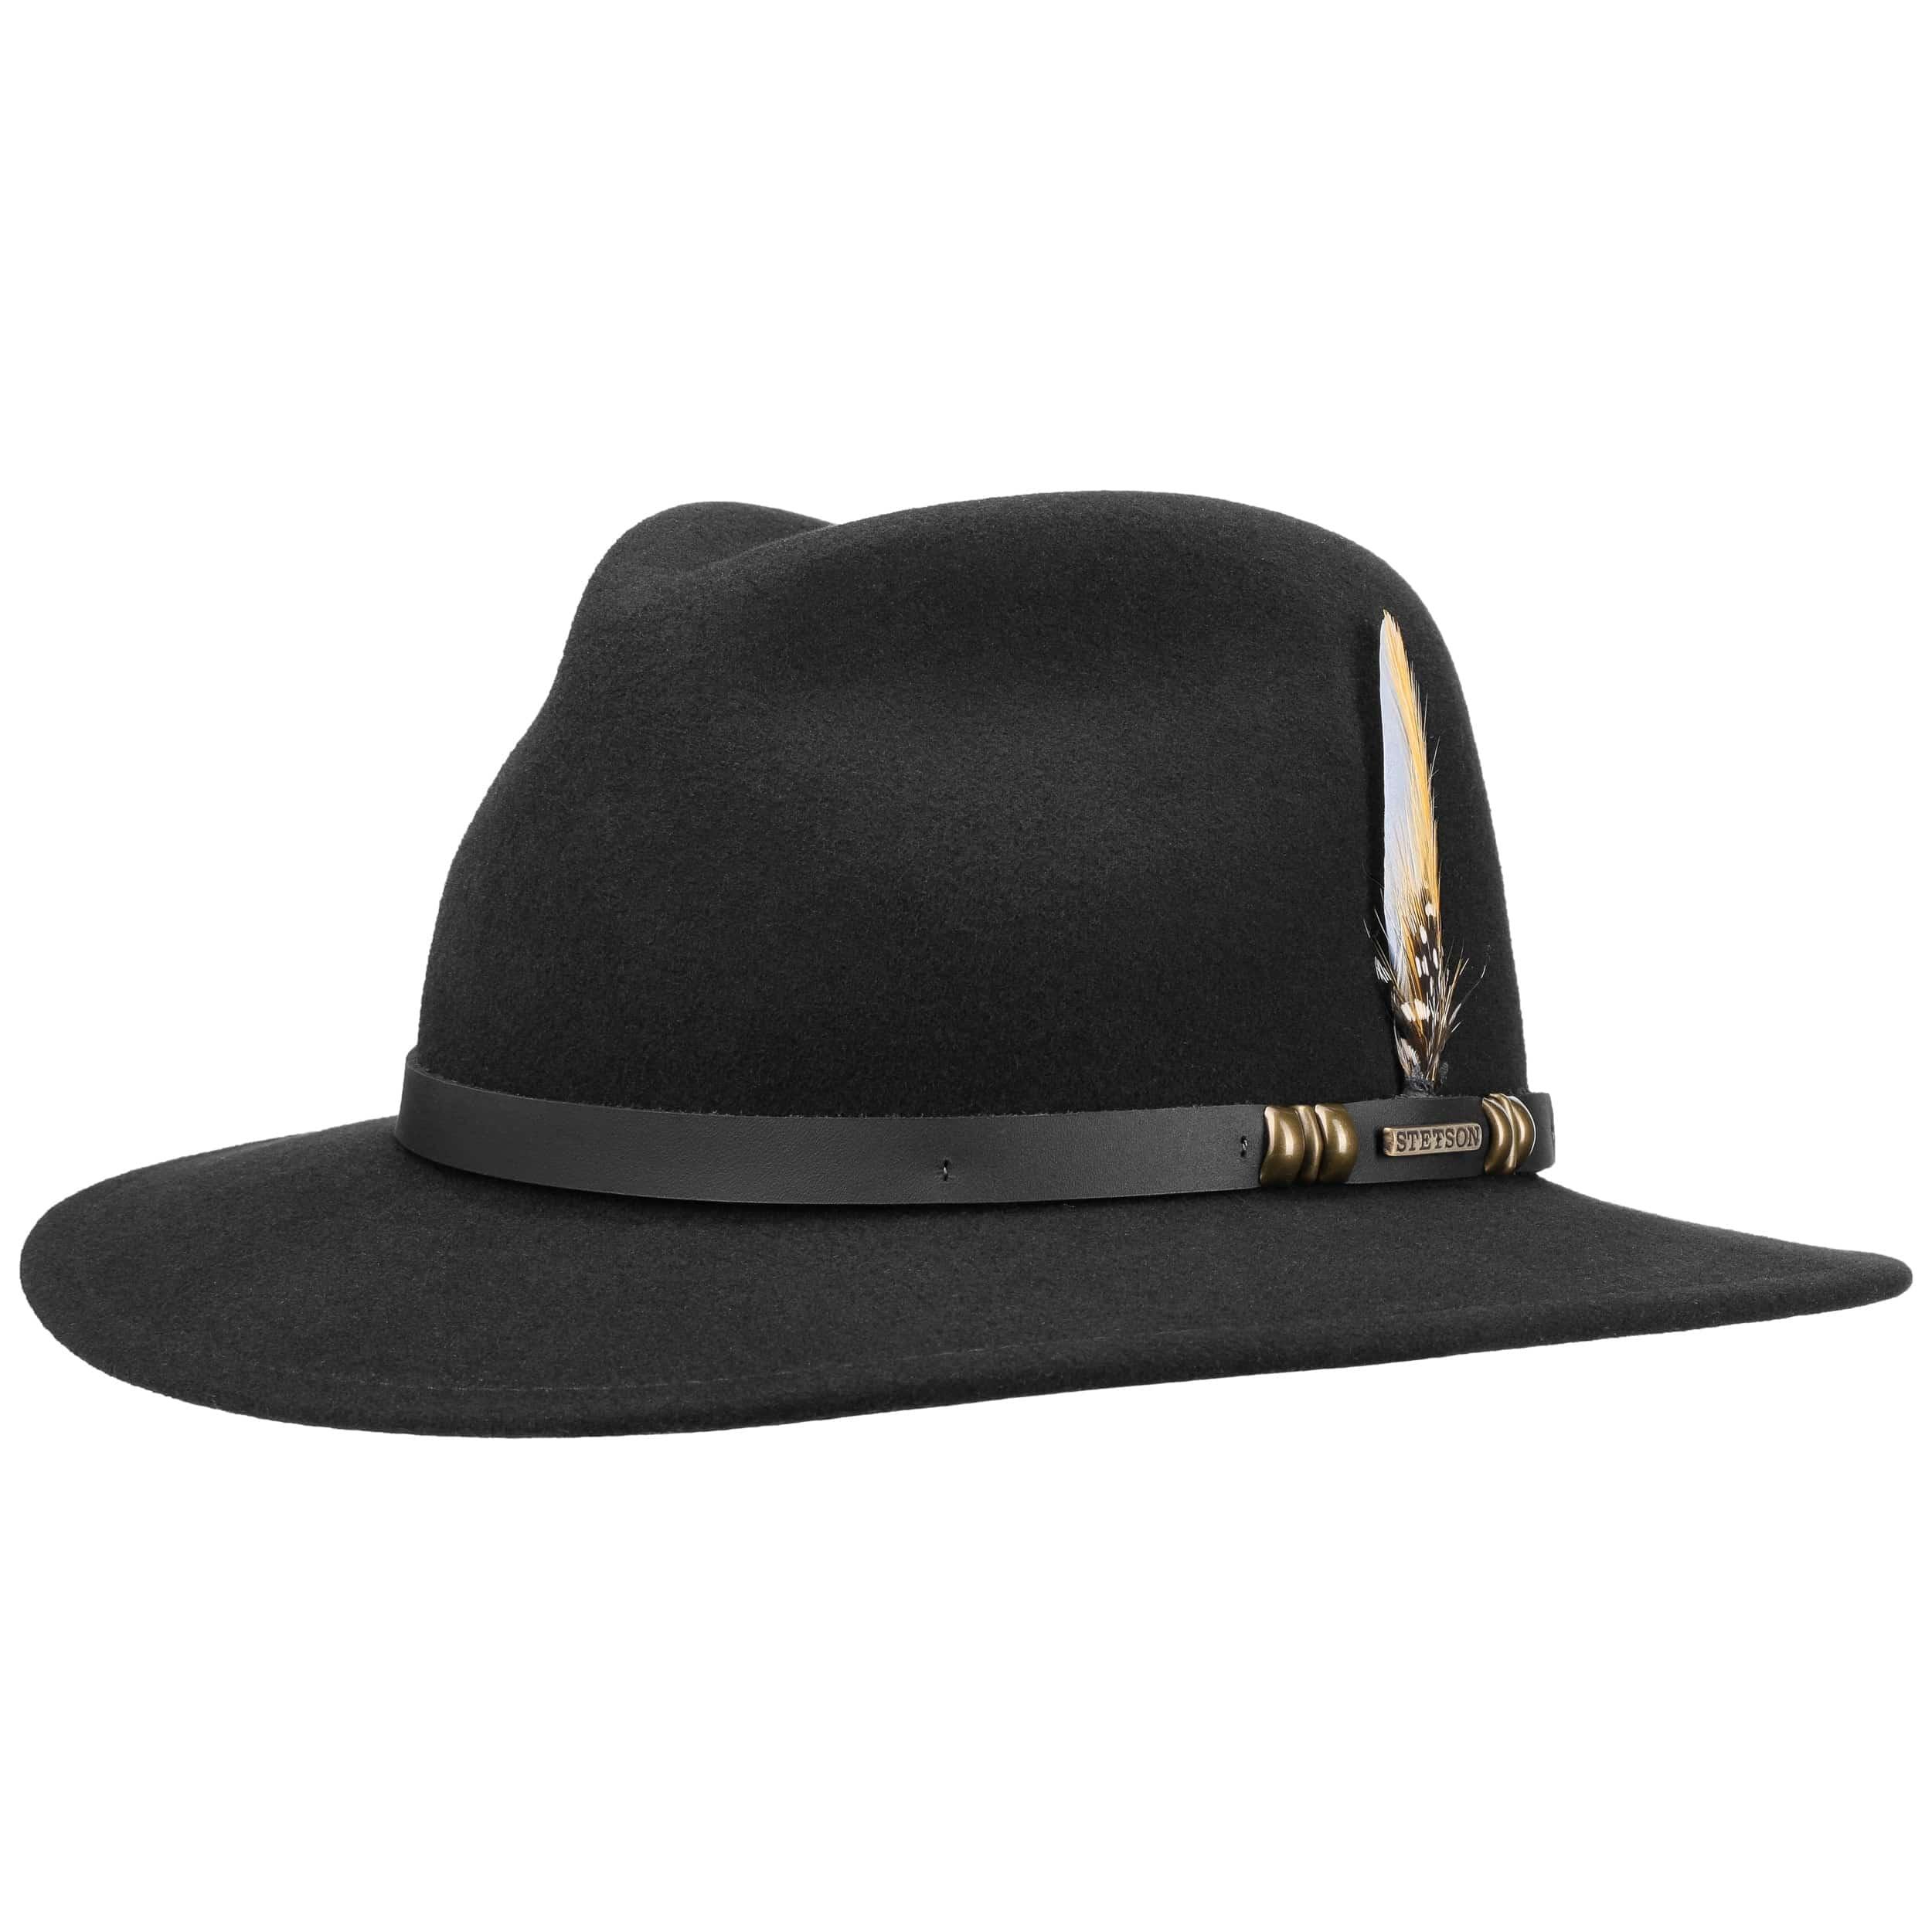 Barley VitaFelt Hat With Ear Flaps. by Stetson d9e2f2d22b24